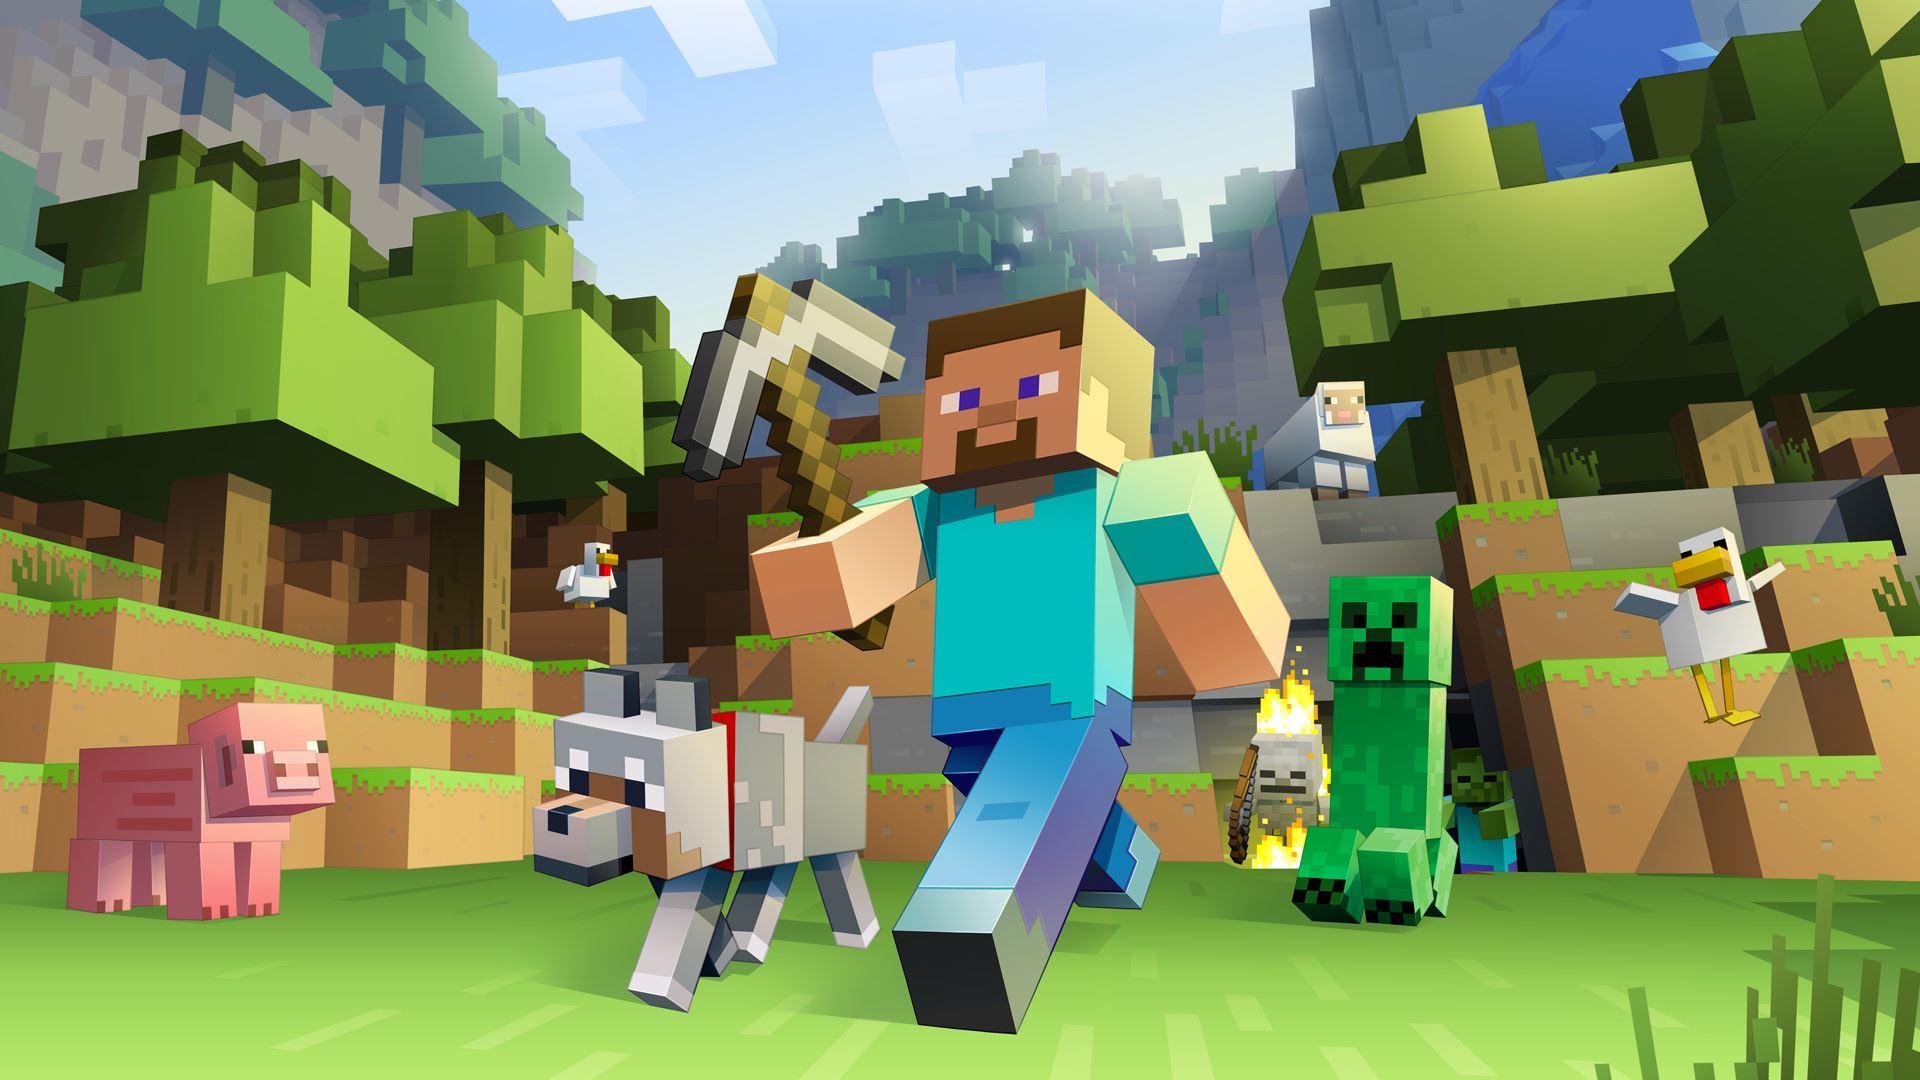 Image illustrant deux petits bonhommes du jeu minecraft.